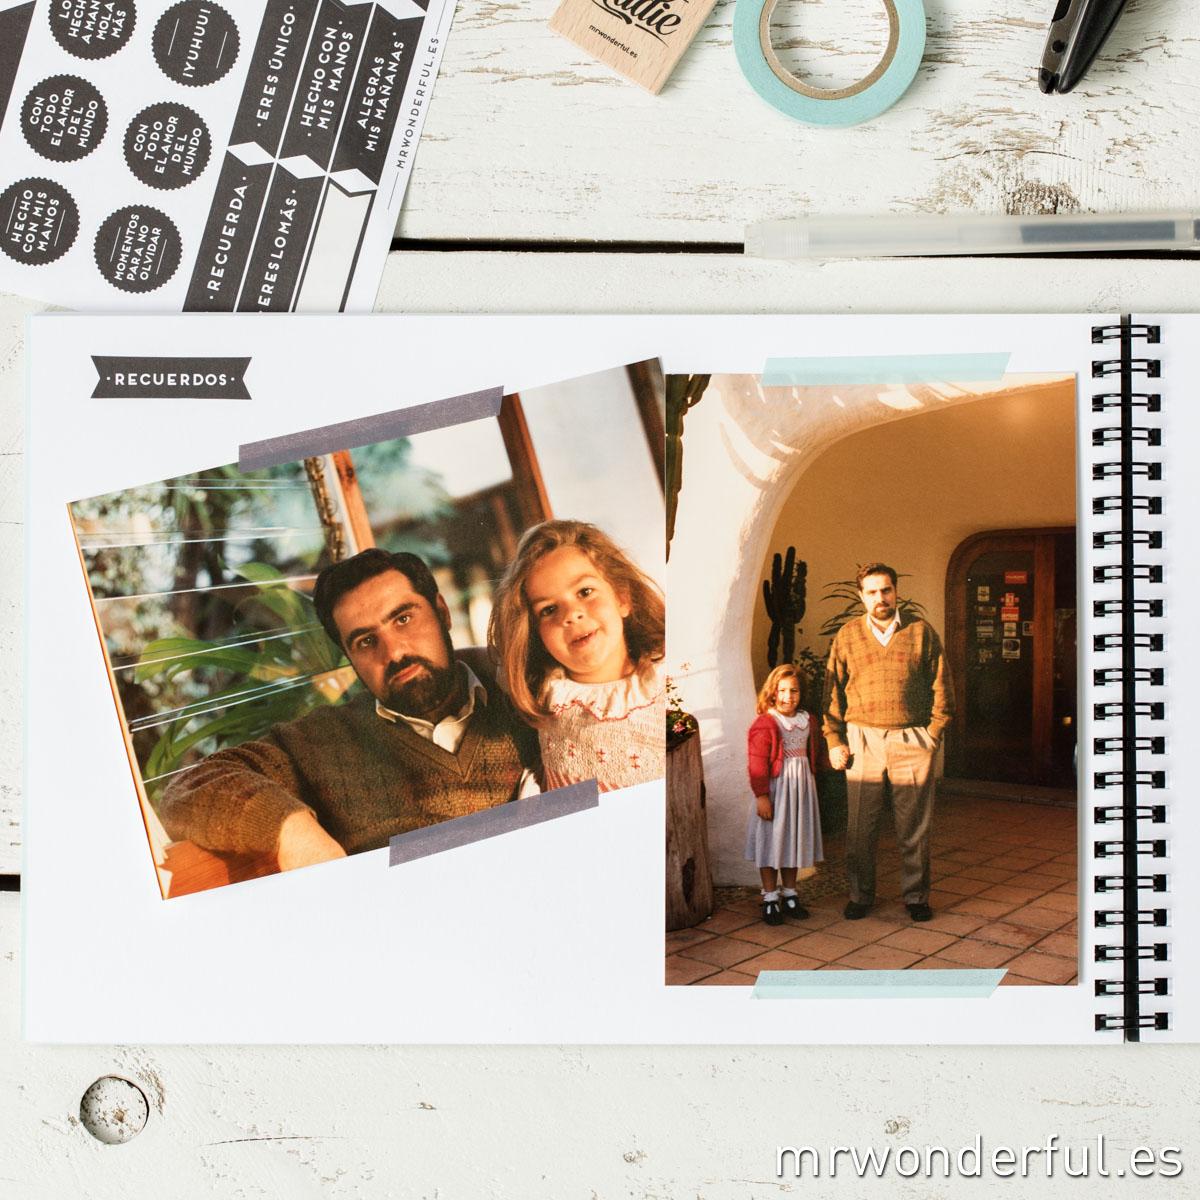 mrwonderful_album_WONDER_01__PAPA-MOMENTOS GENIALES-59